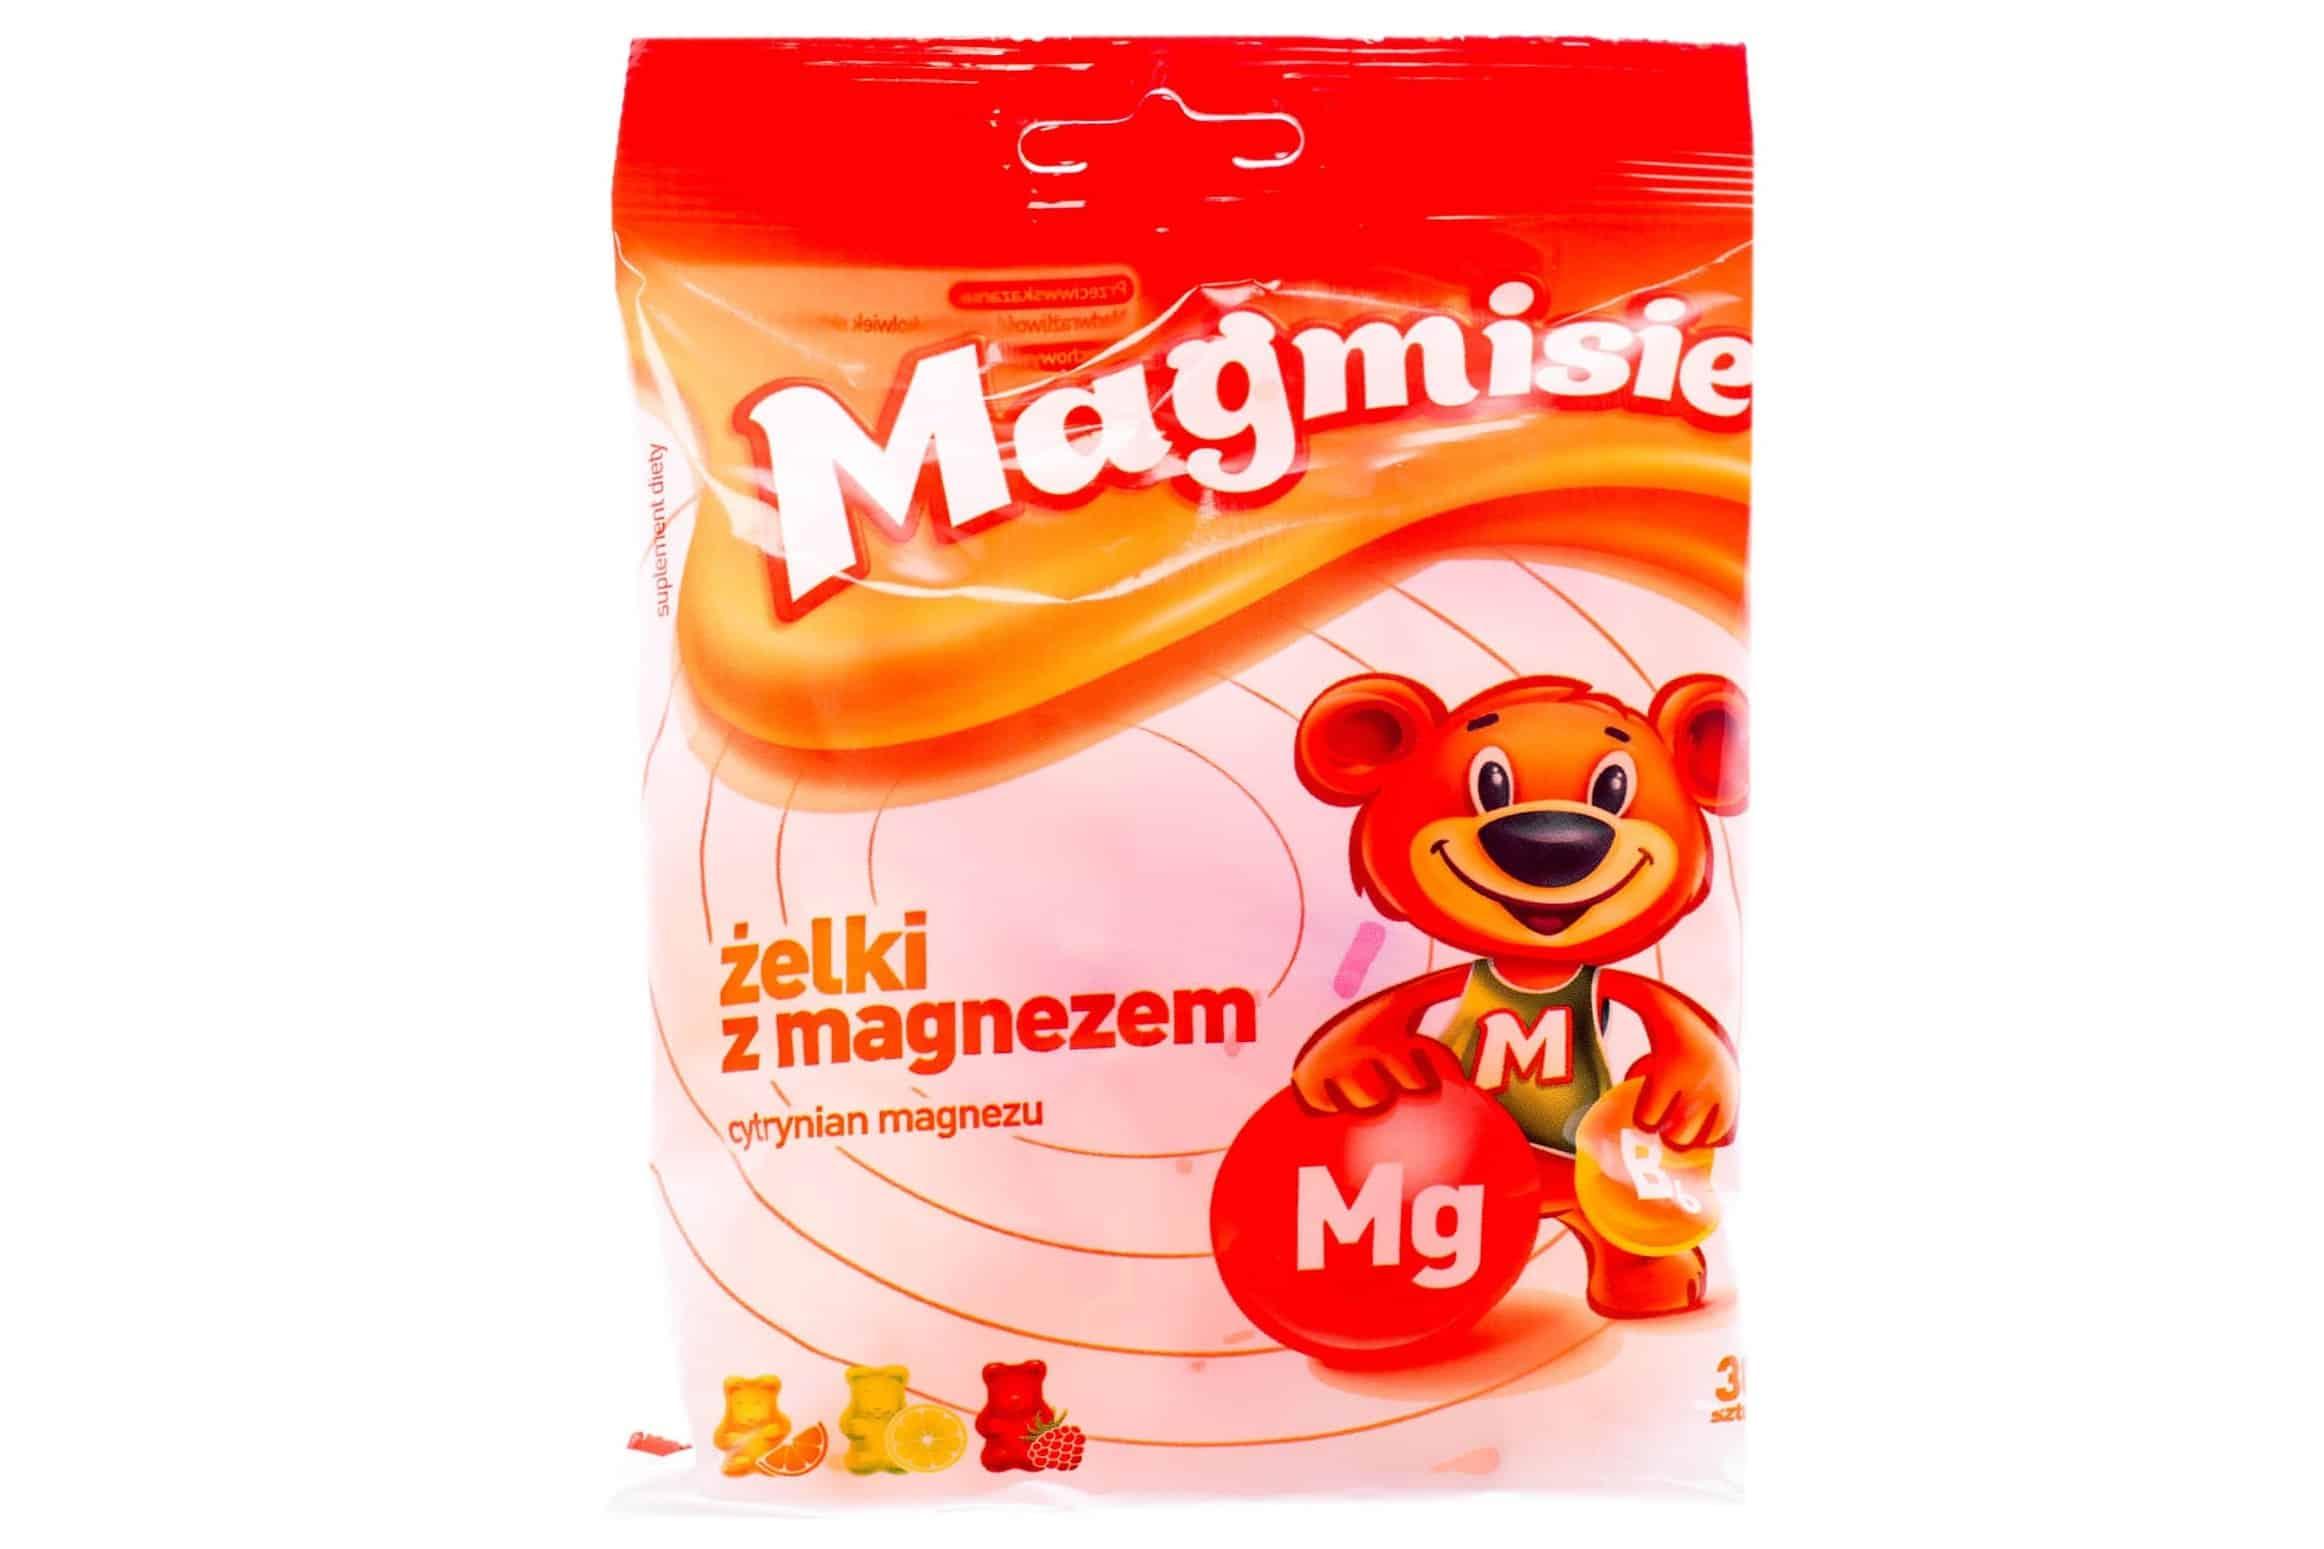 Magmisie, żelki zmagnezem, magnez dla dzieci, suplement diety Matka Aptekarka